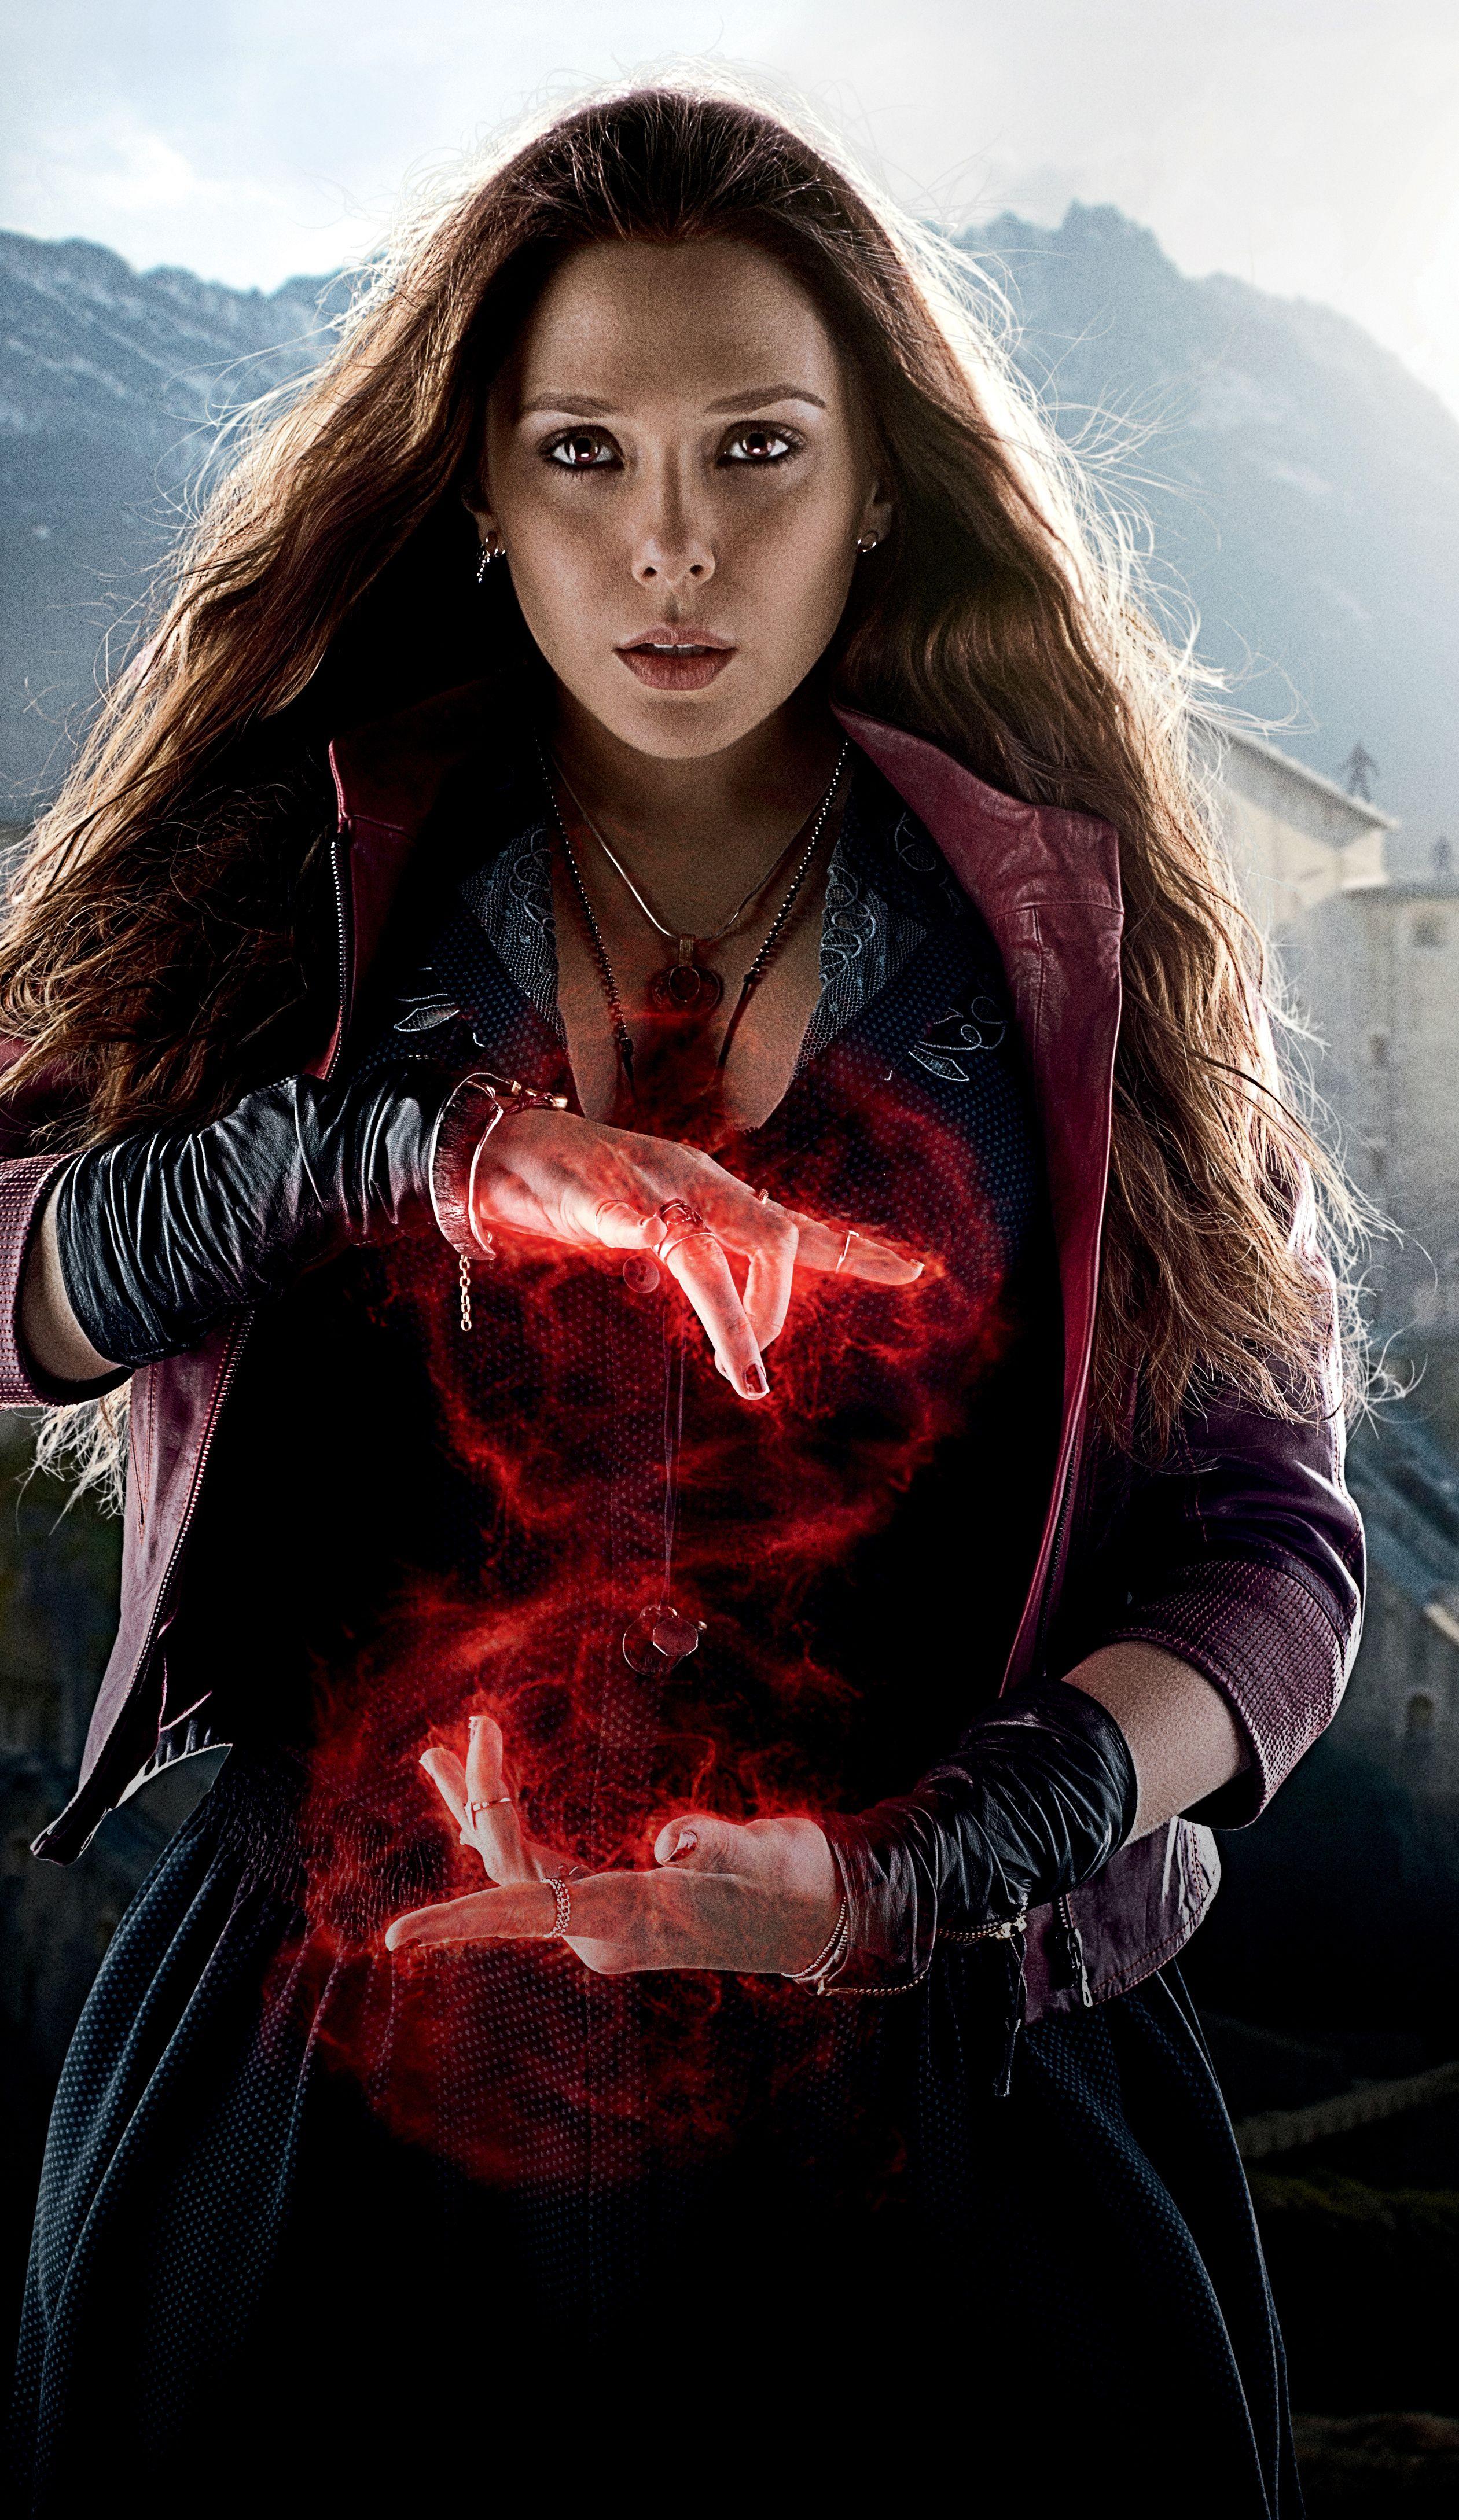 Elizabeth Olsen Is The Scarlet Witch